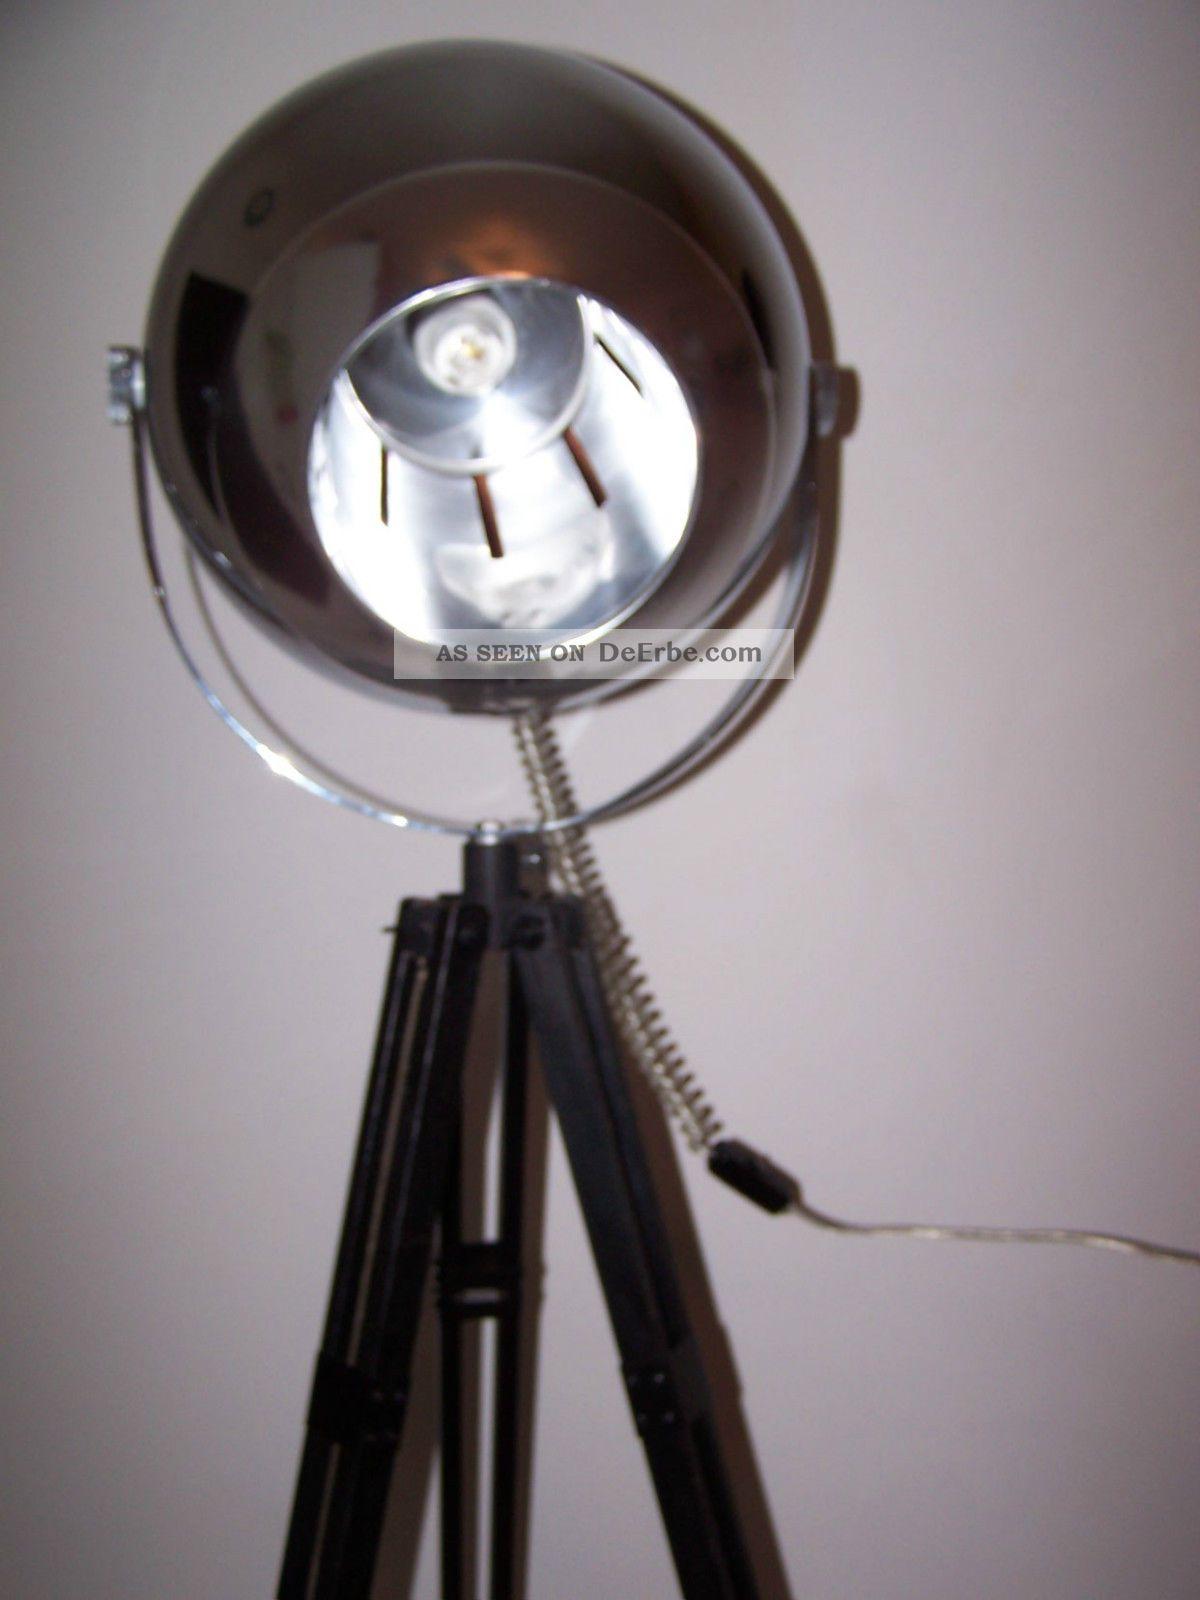 bauhaus stehlampe tripod lampe art deco chrom kugel strahler mid century lamp. Black Bedroom Furniture Sets. Home Design Ideas